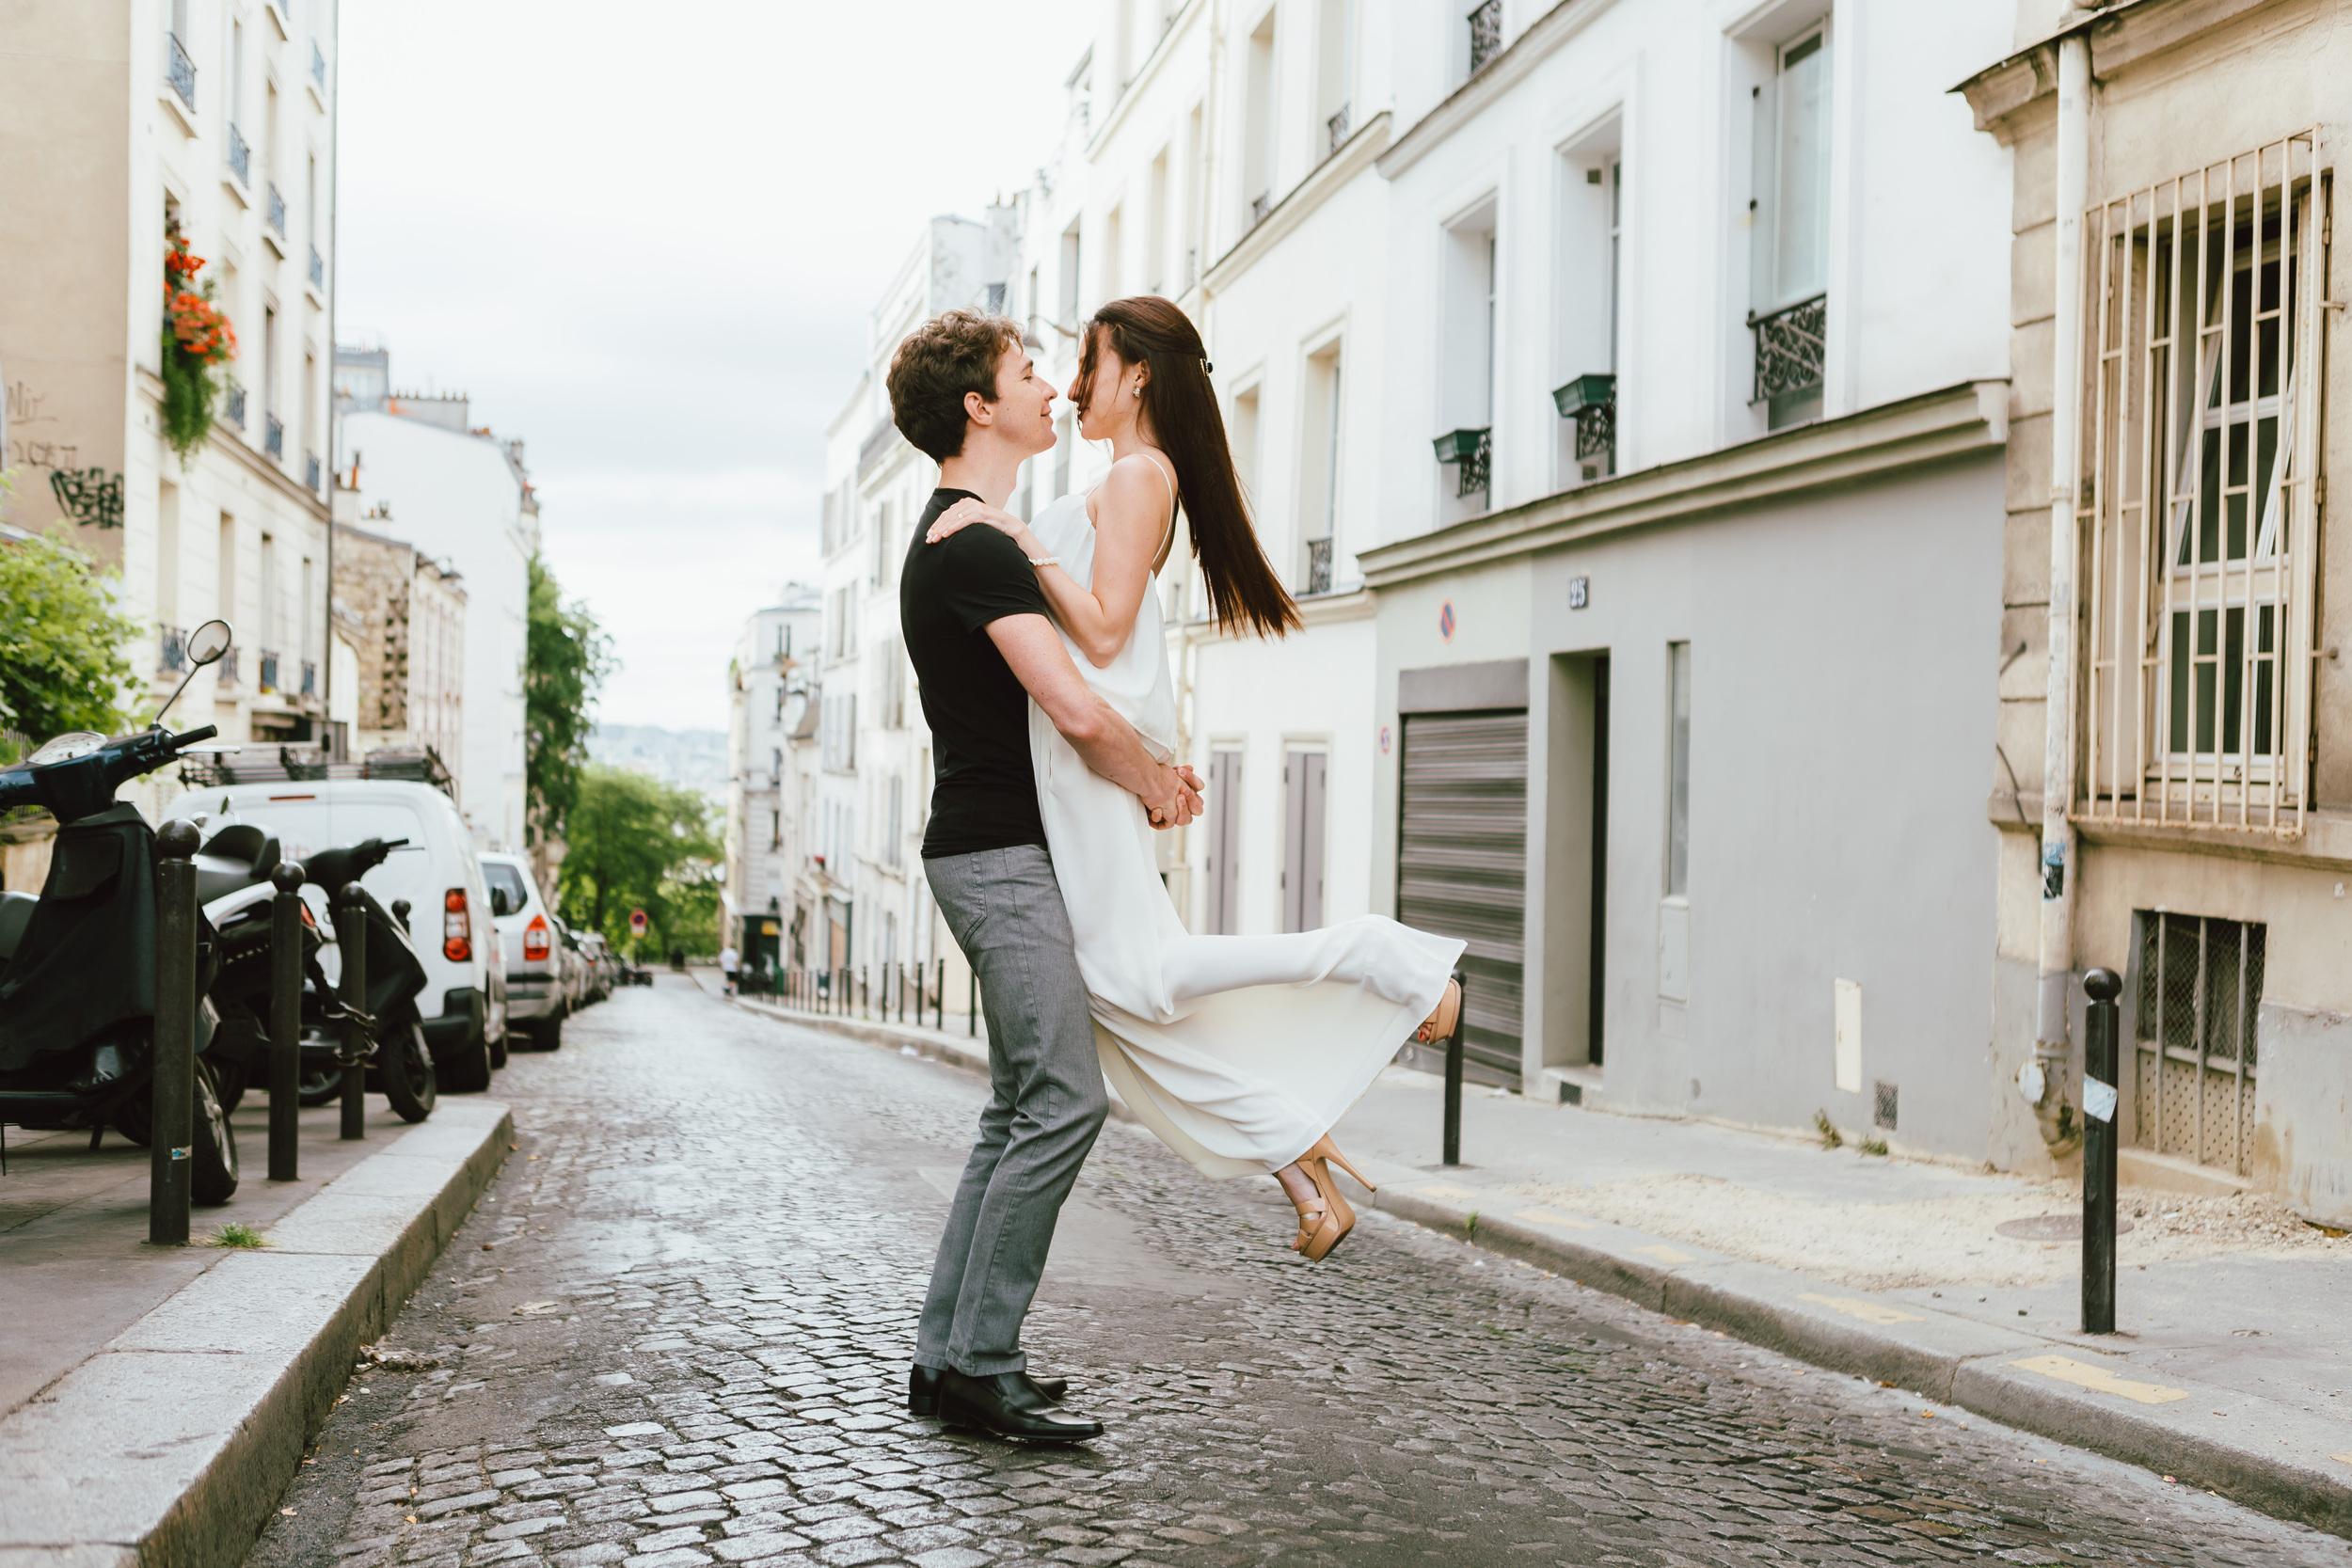 Photographer in Paris, Montmartre, Lovestory, France, in love in Paris, iheartparisfr